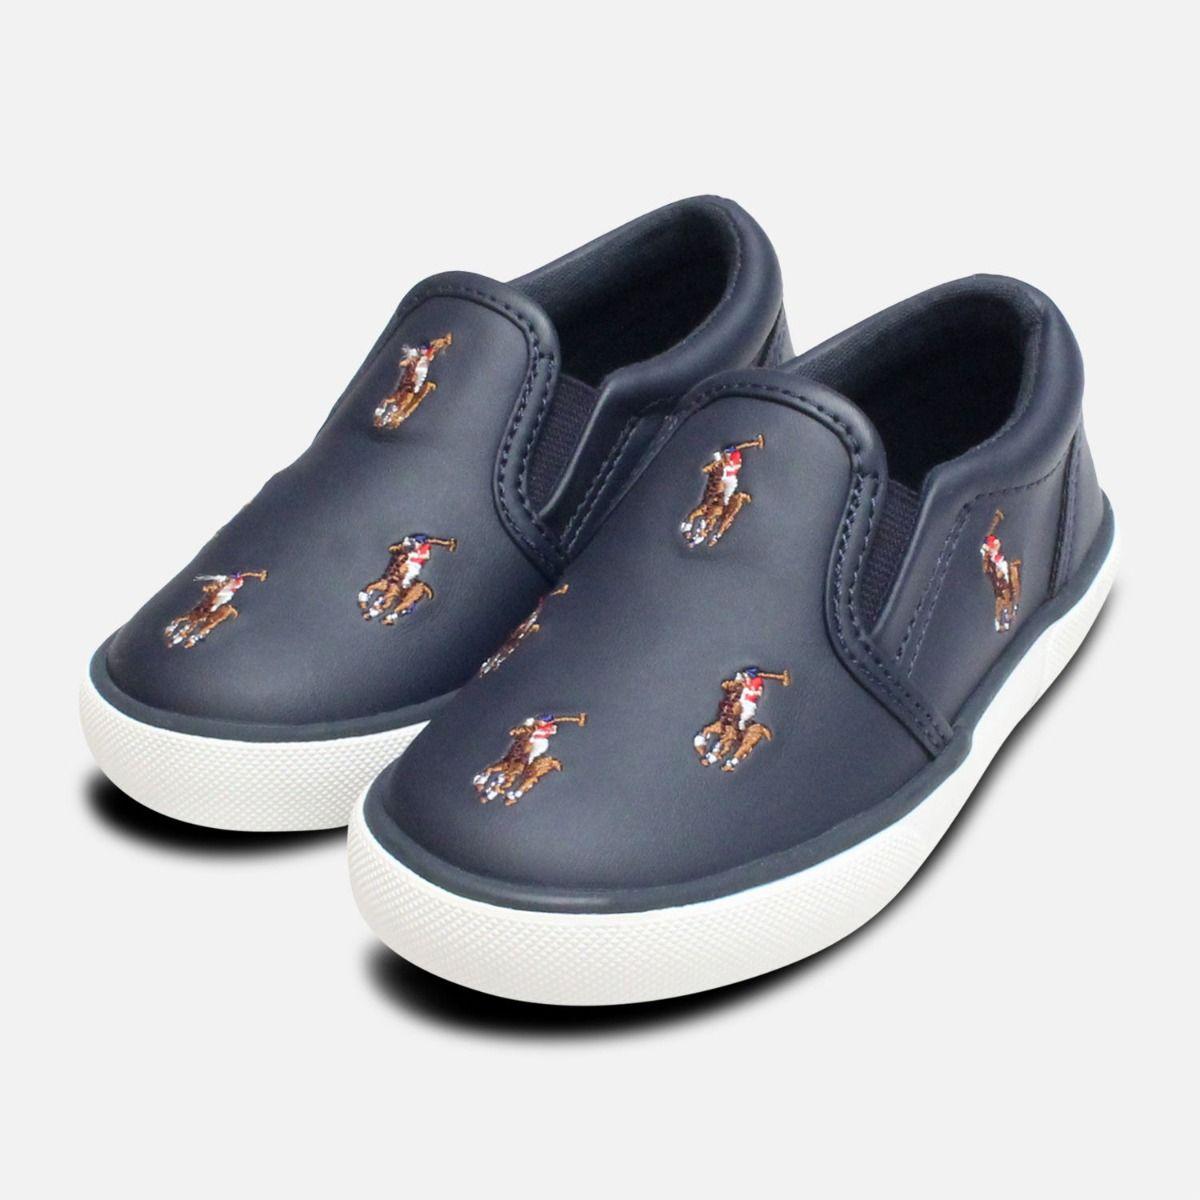 Childrens Shoe Navy Lauren Bal Polo Blue Harbour Ralph 1cFKJl